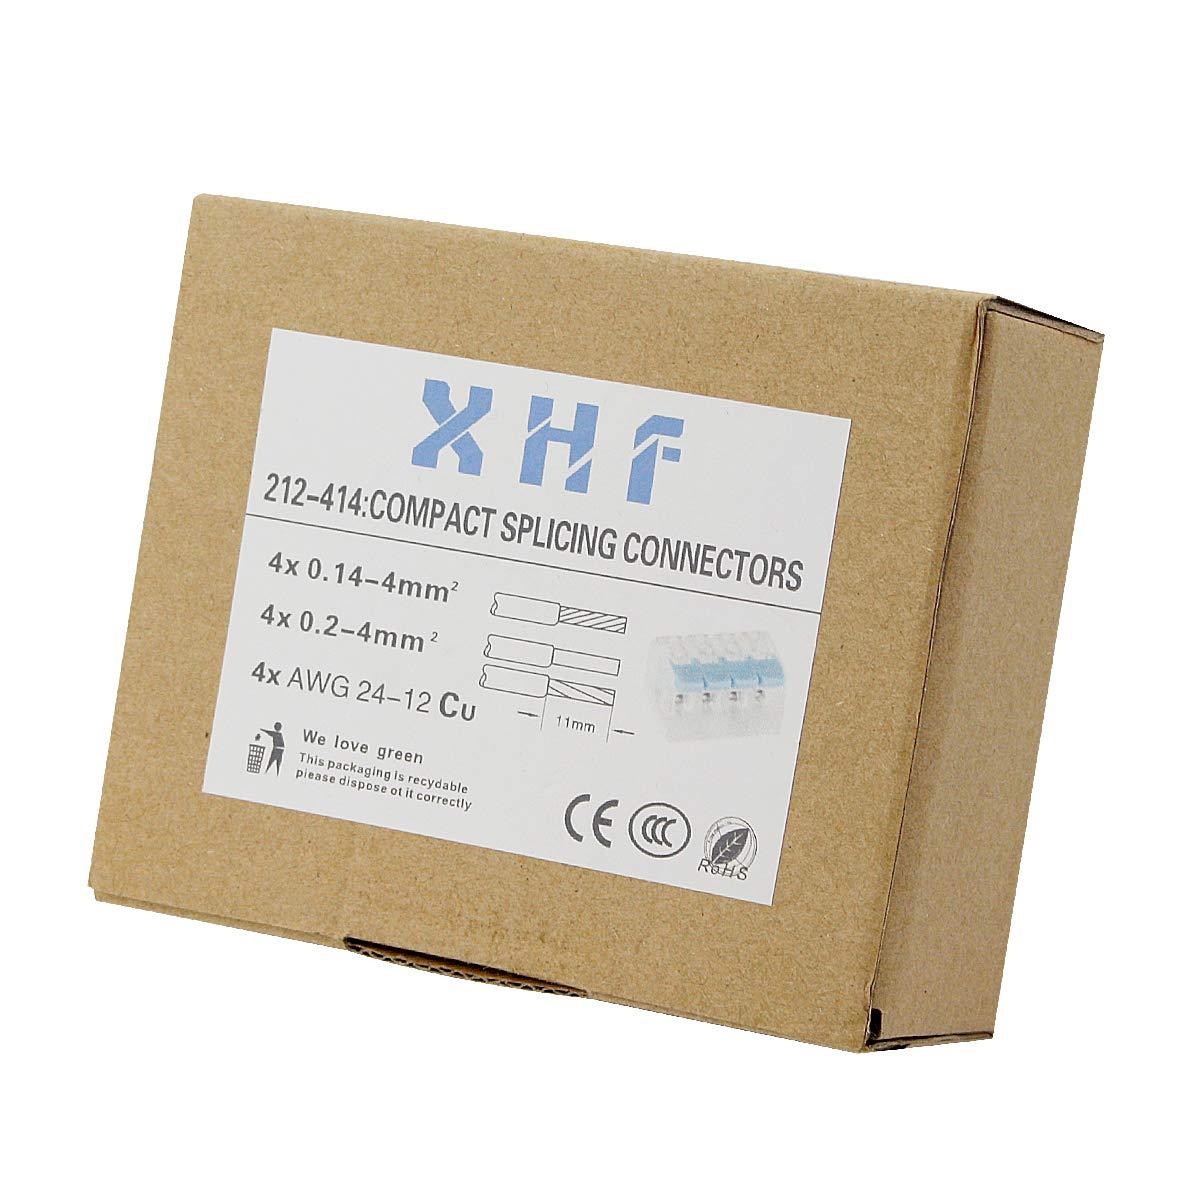 XHF2018 221-414 Lever-nuts4 Conductor Compact Splicing Connectors 10